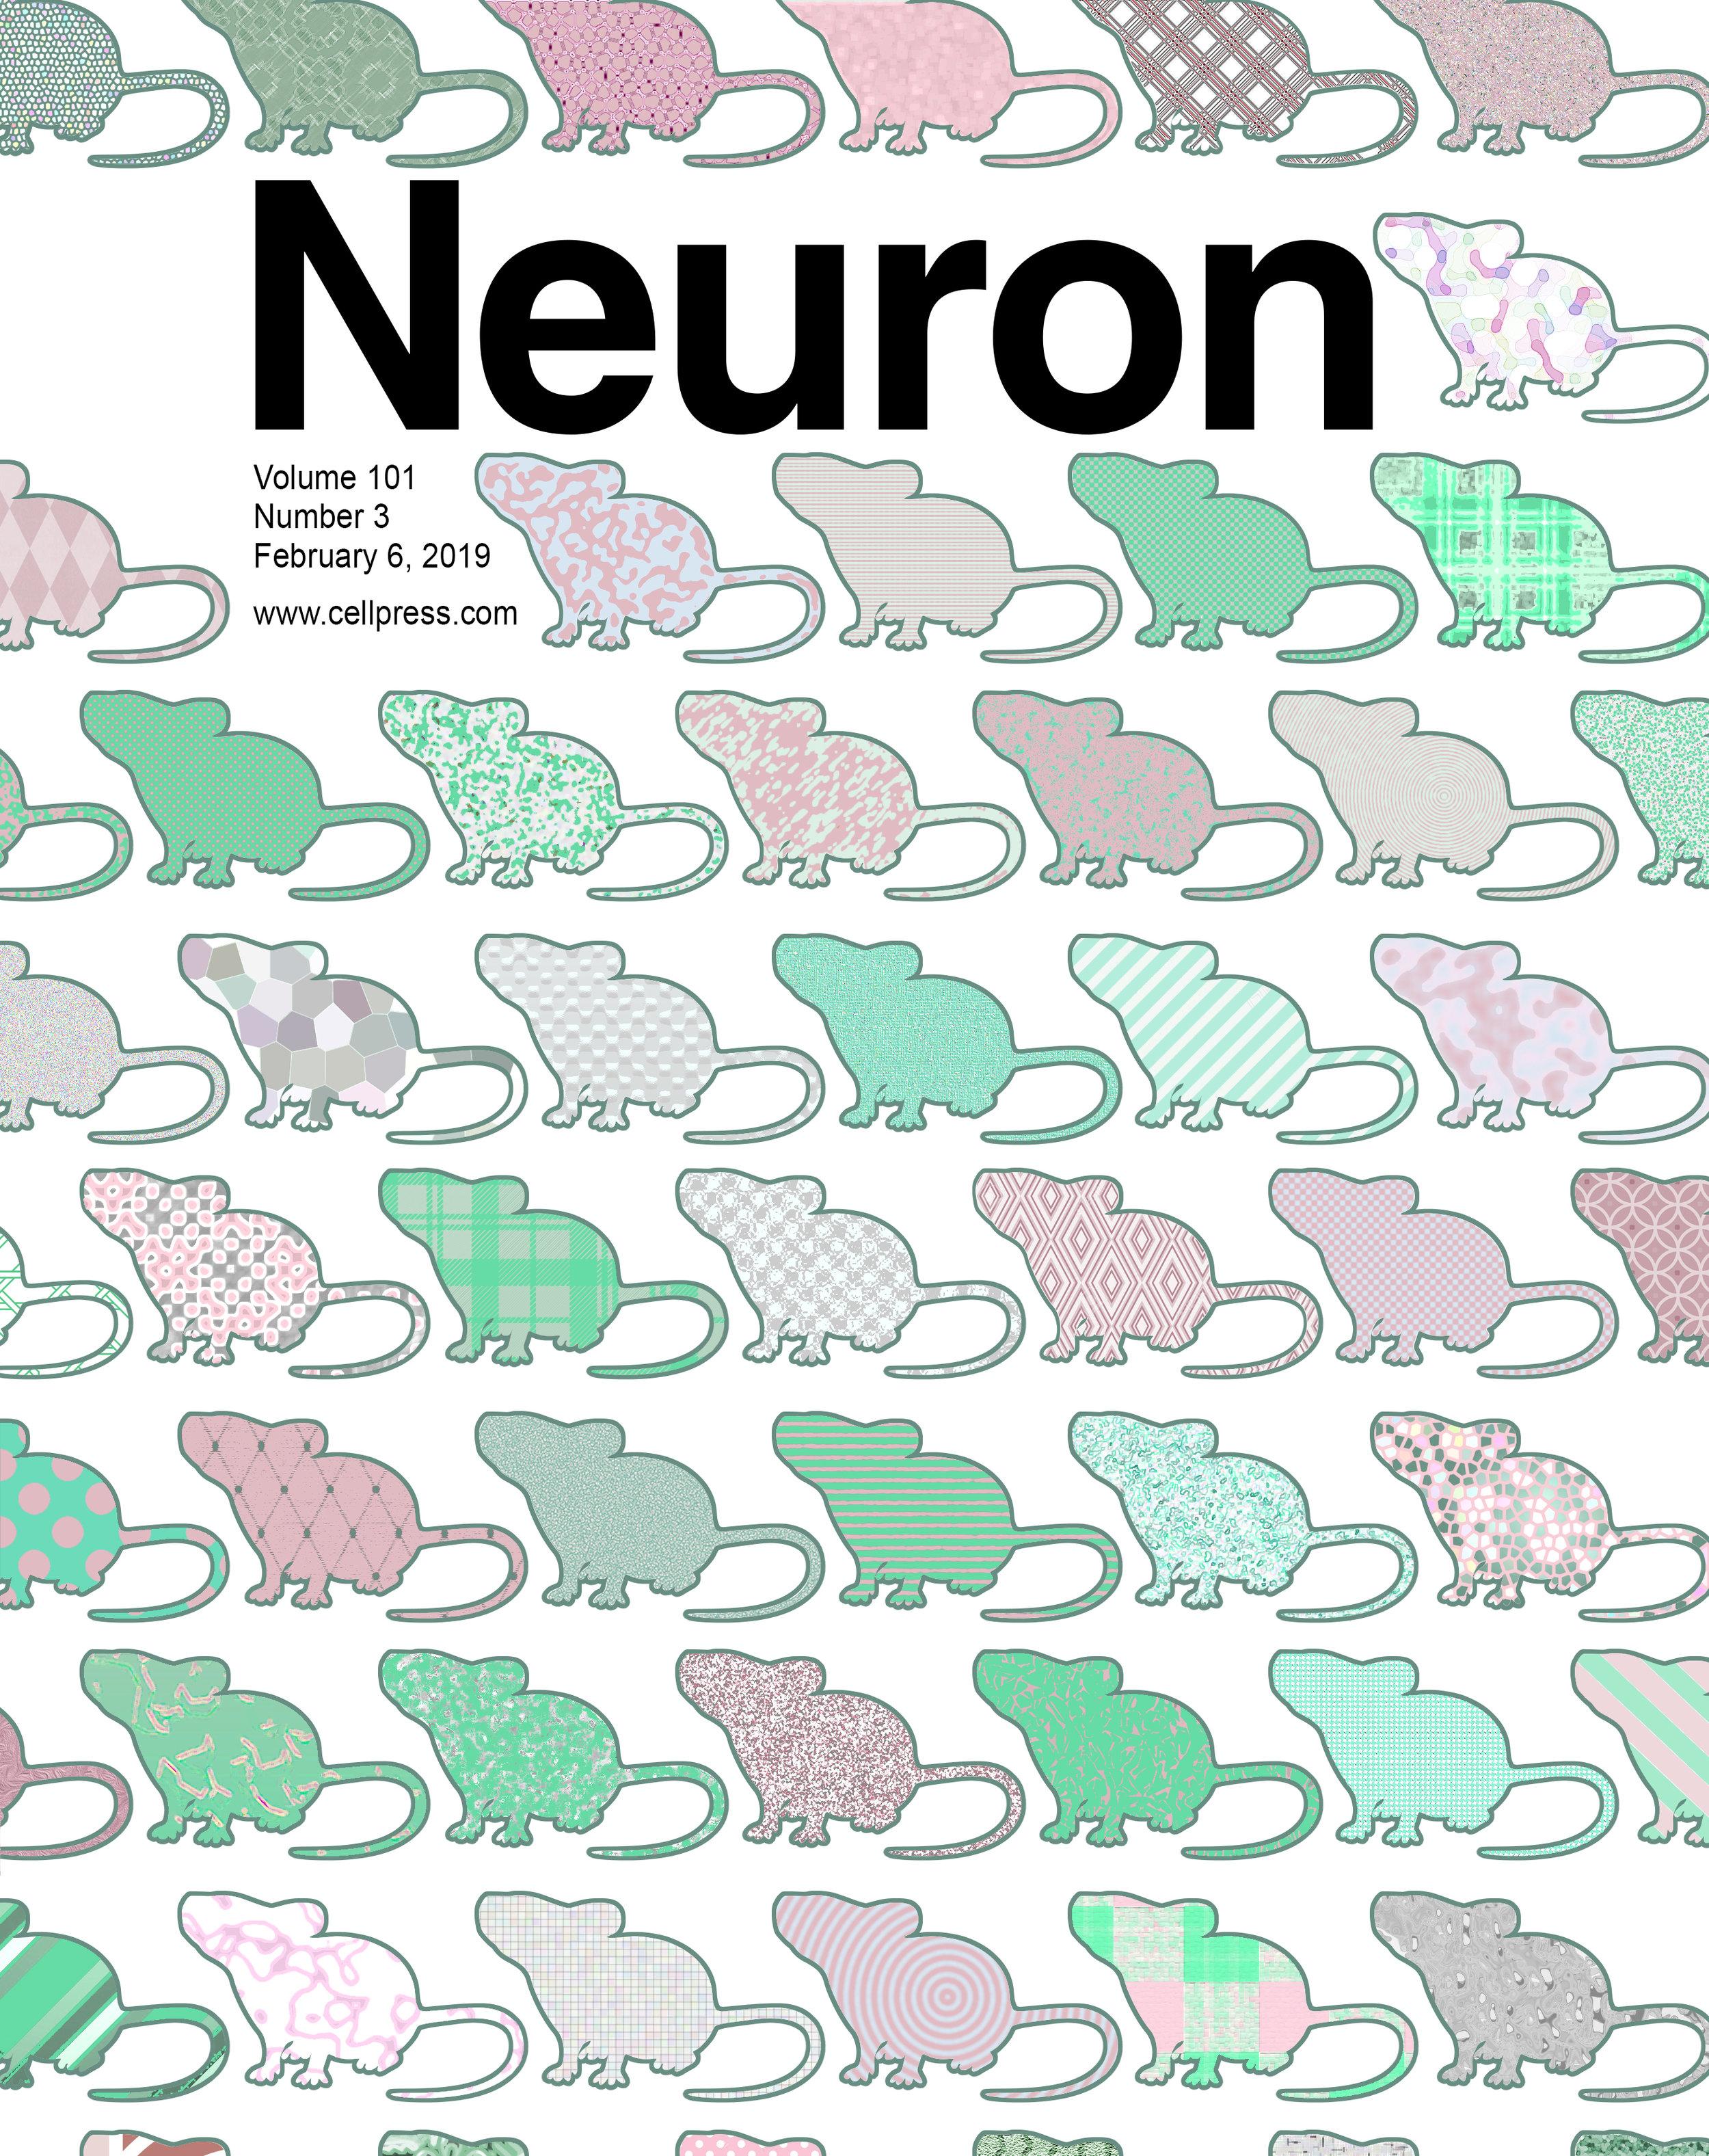 Neuron_cover_kaczorowski, neuner.jpg